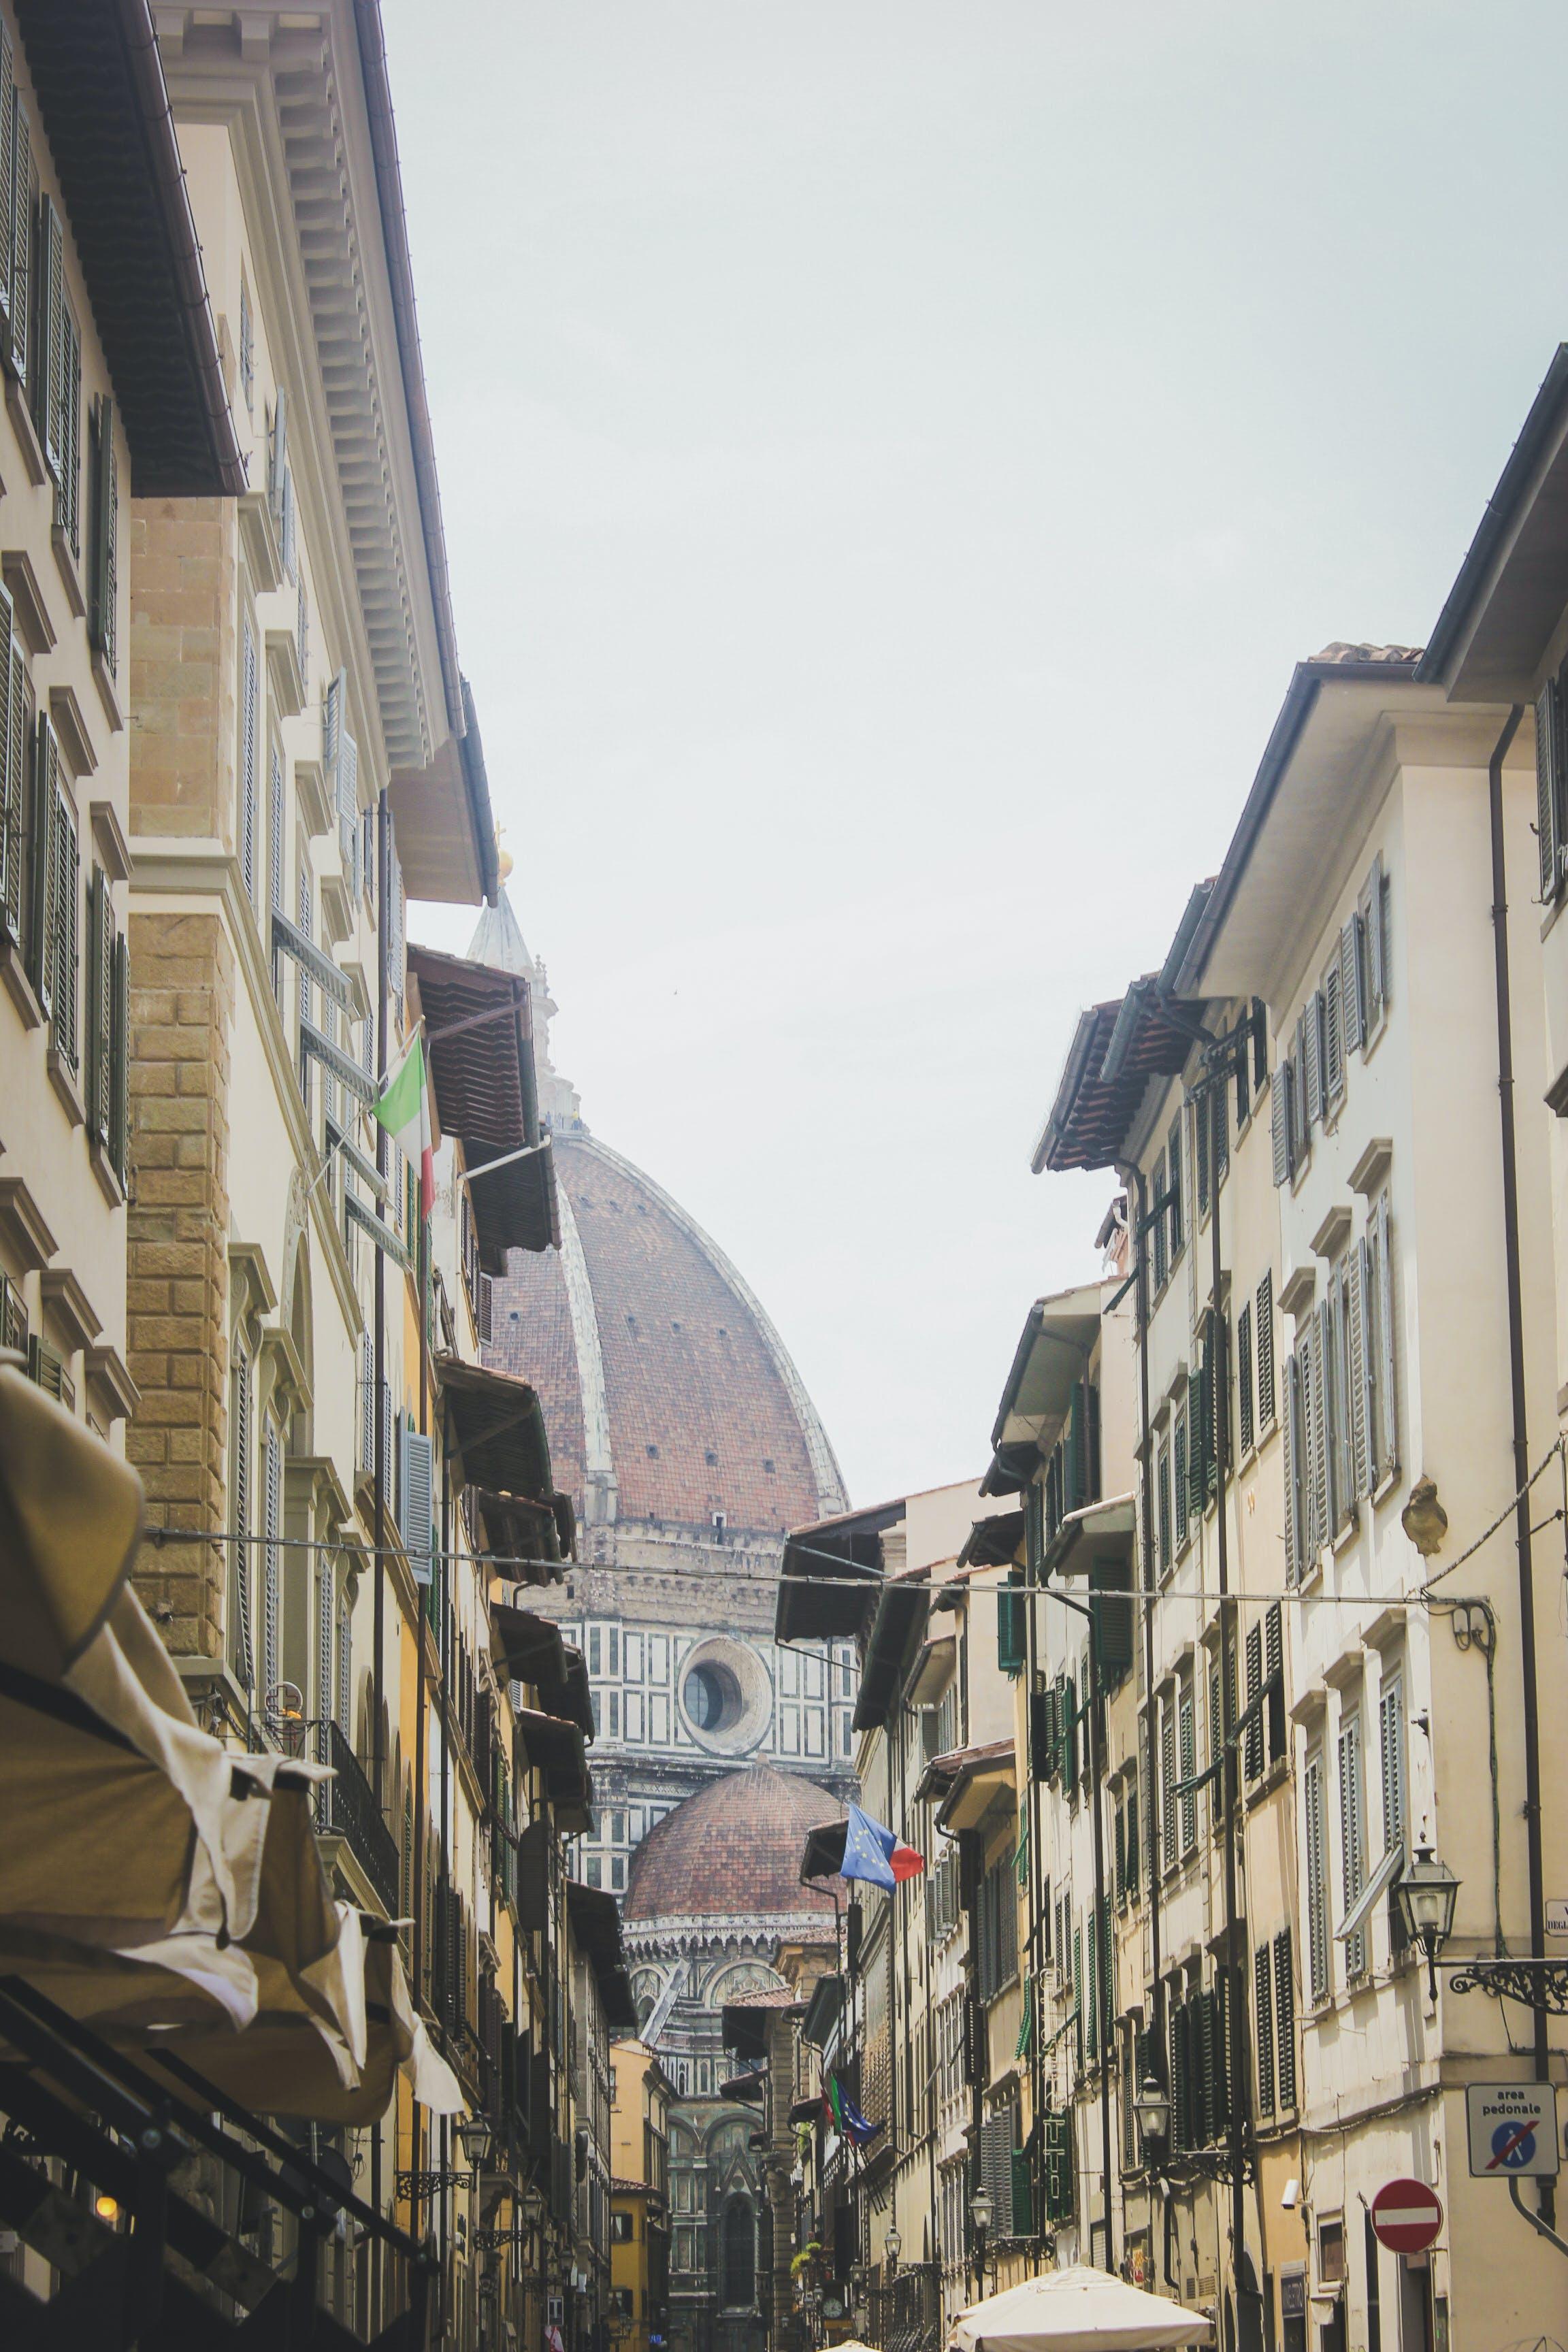 Free stock photo of city, street, building, italy